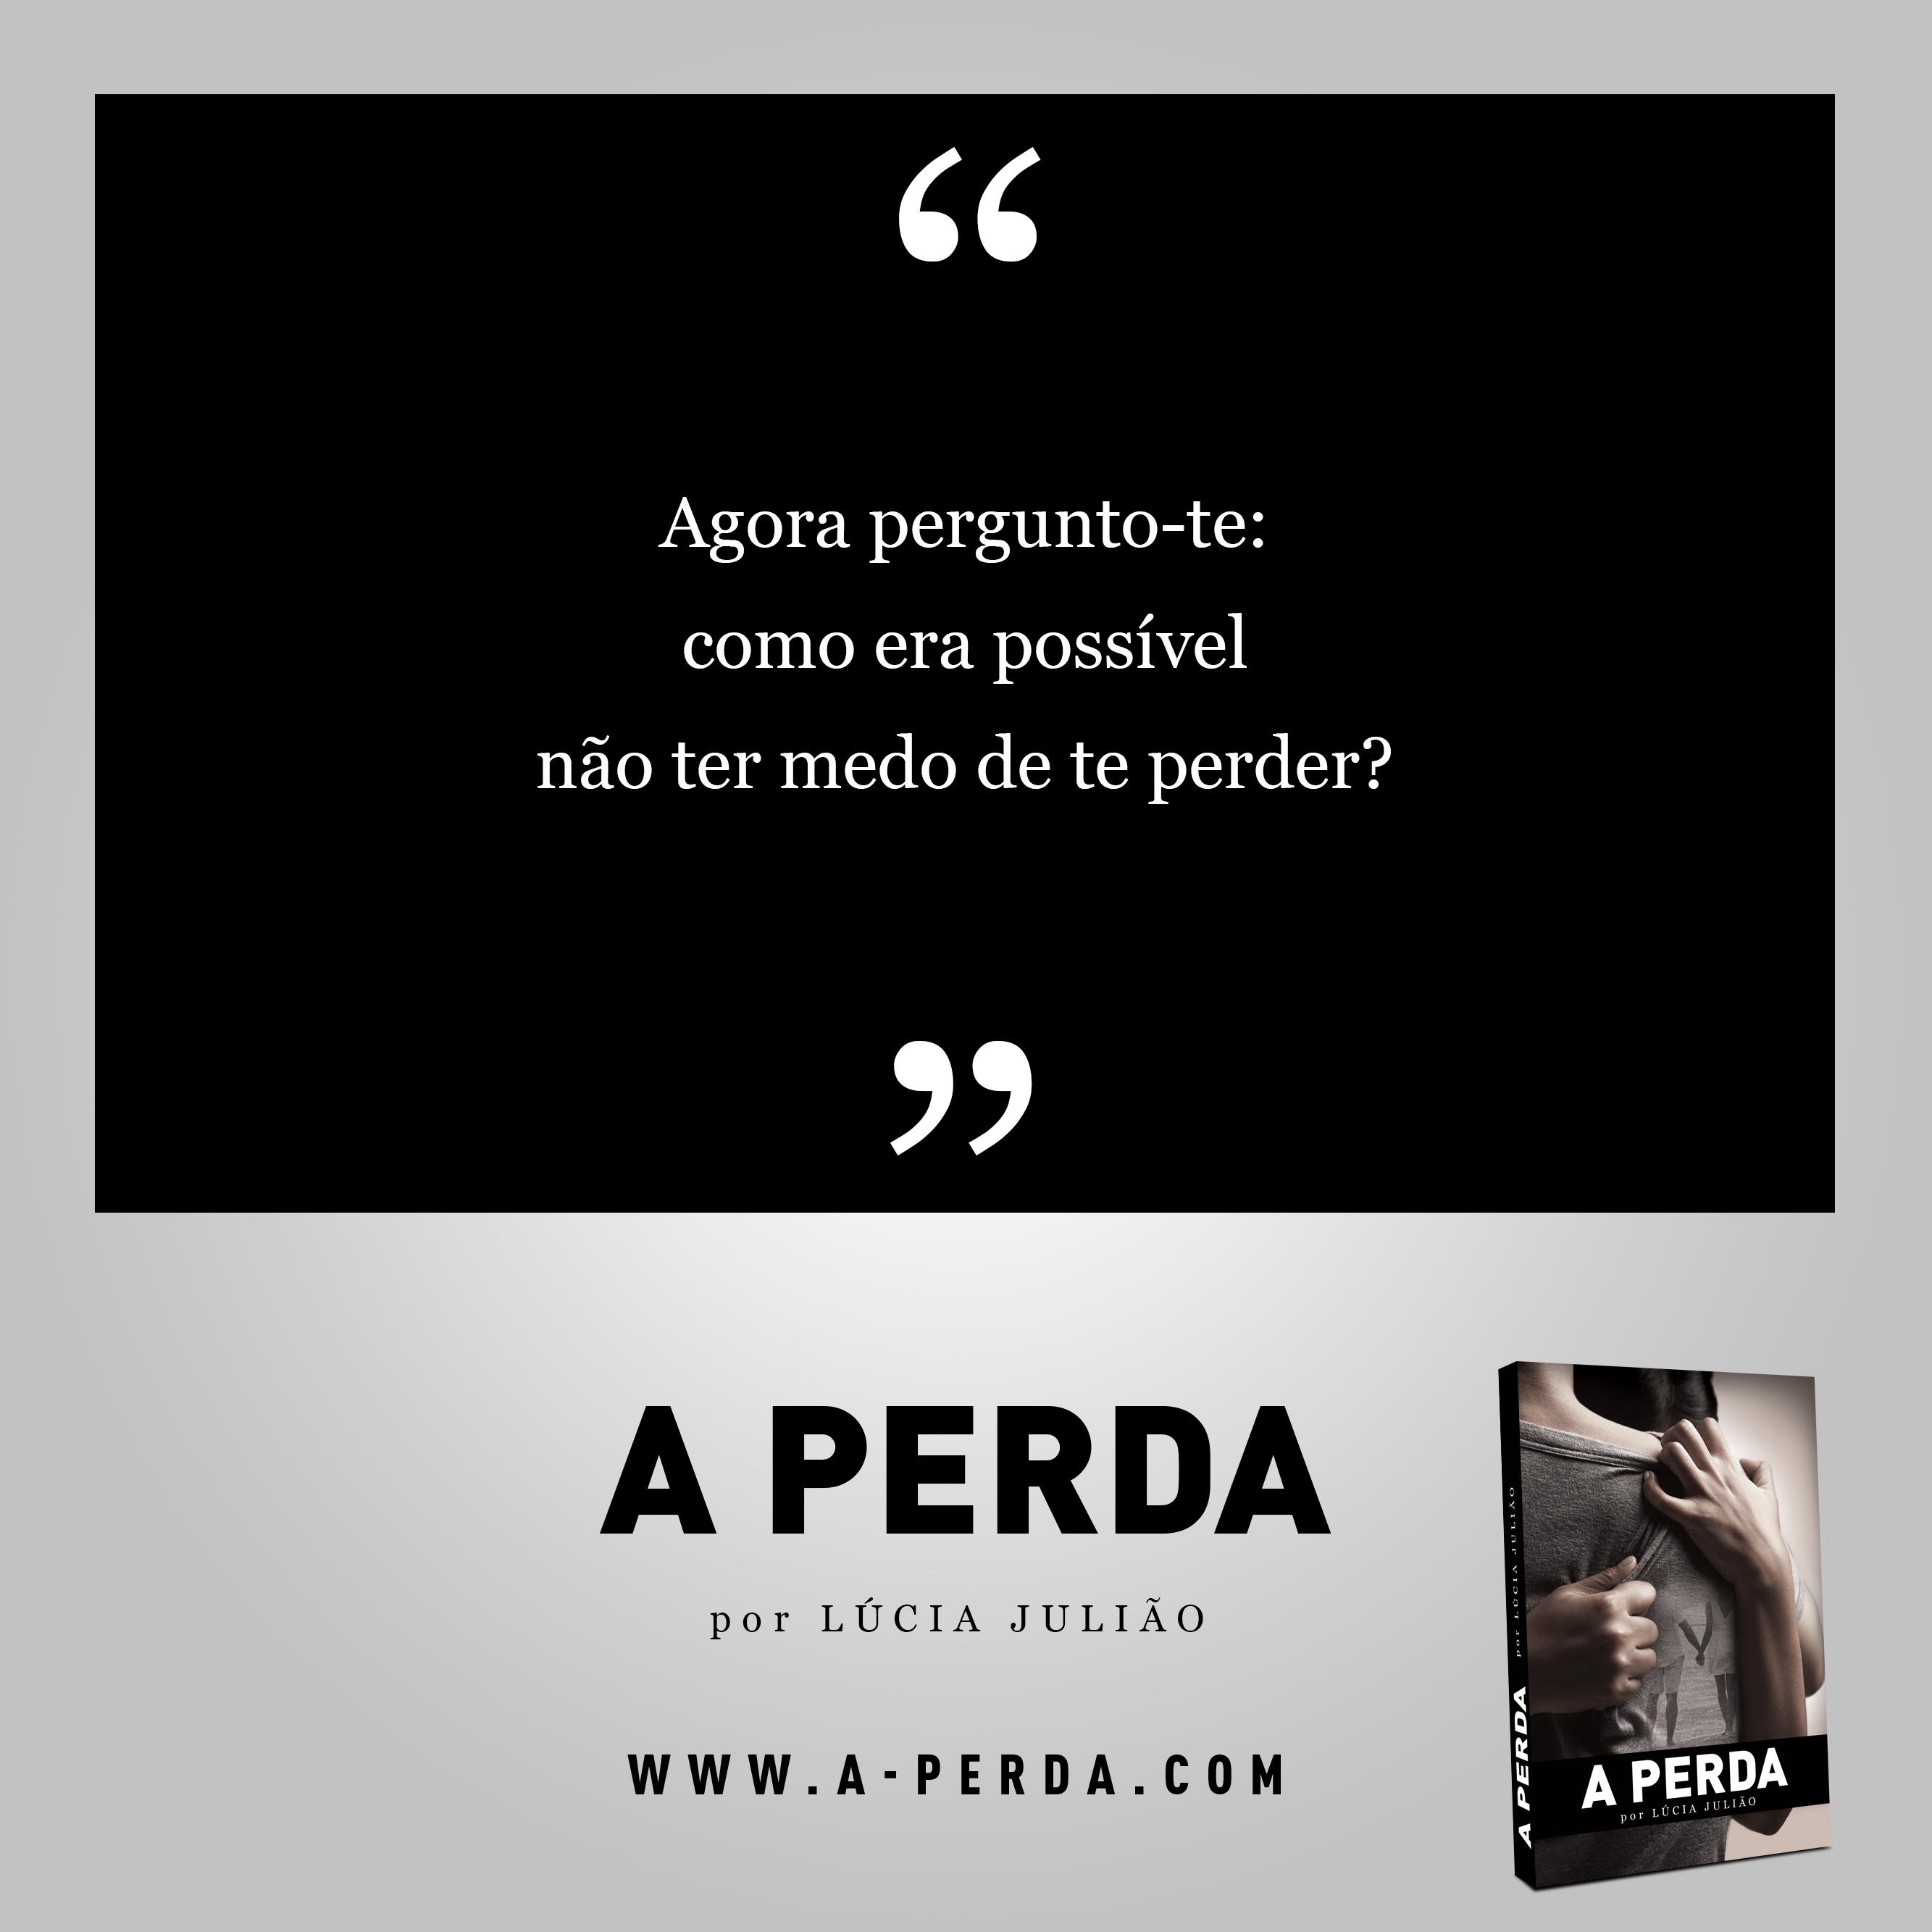 019-capitulo-11-livro-a-Perda-de-Lucia-Juliao-Instagram